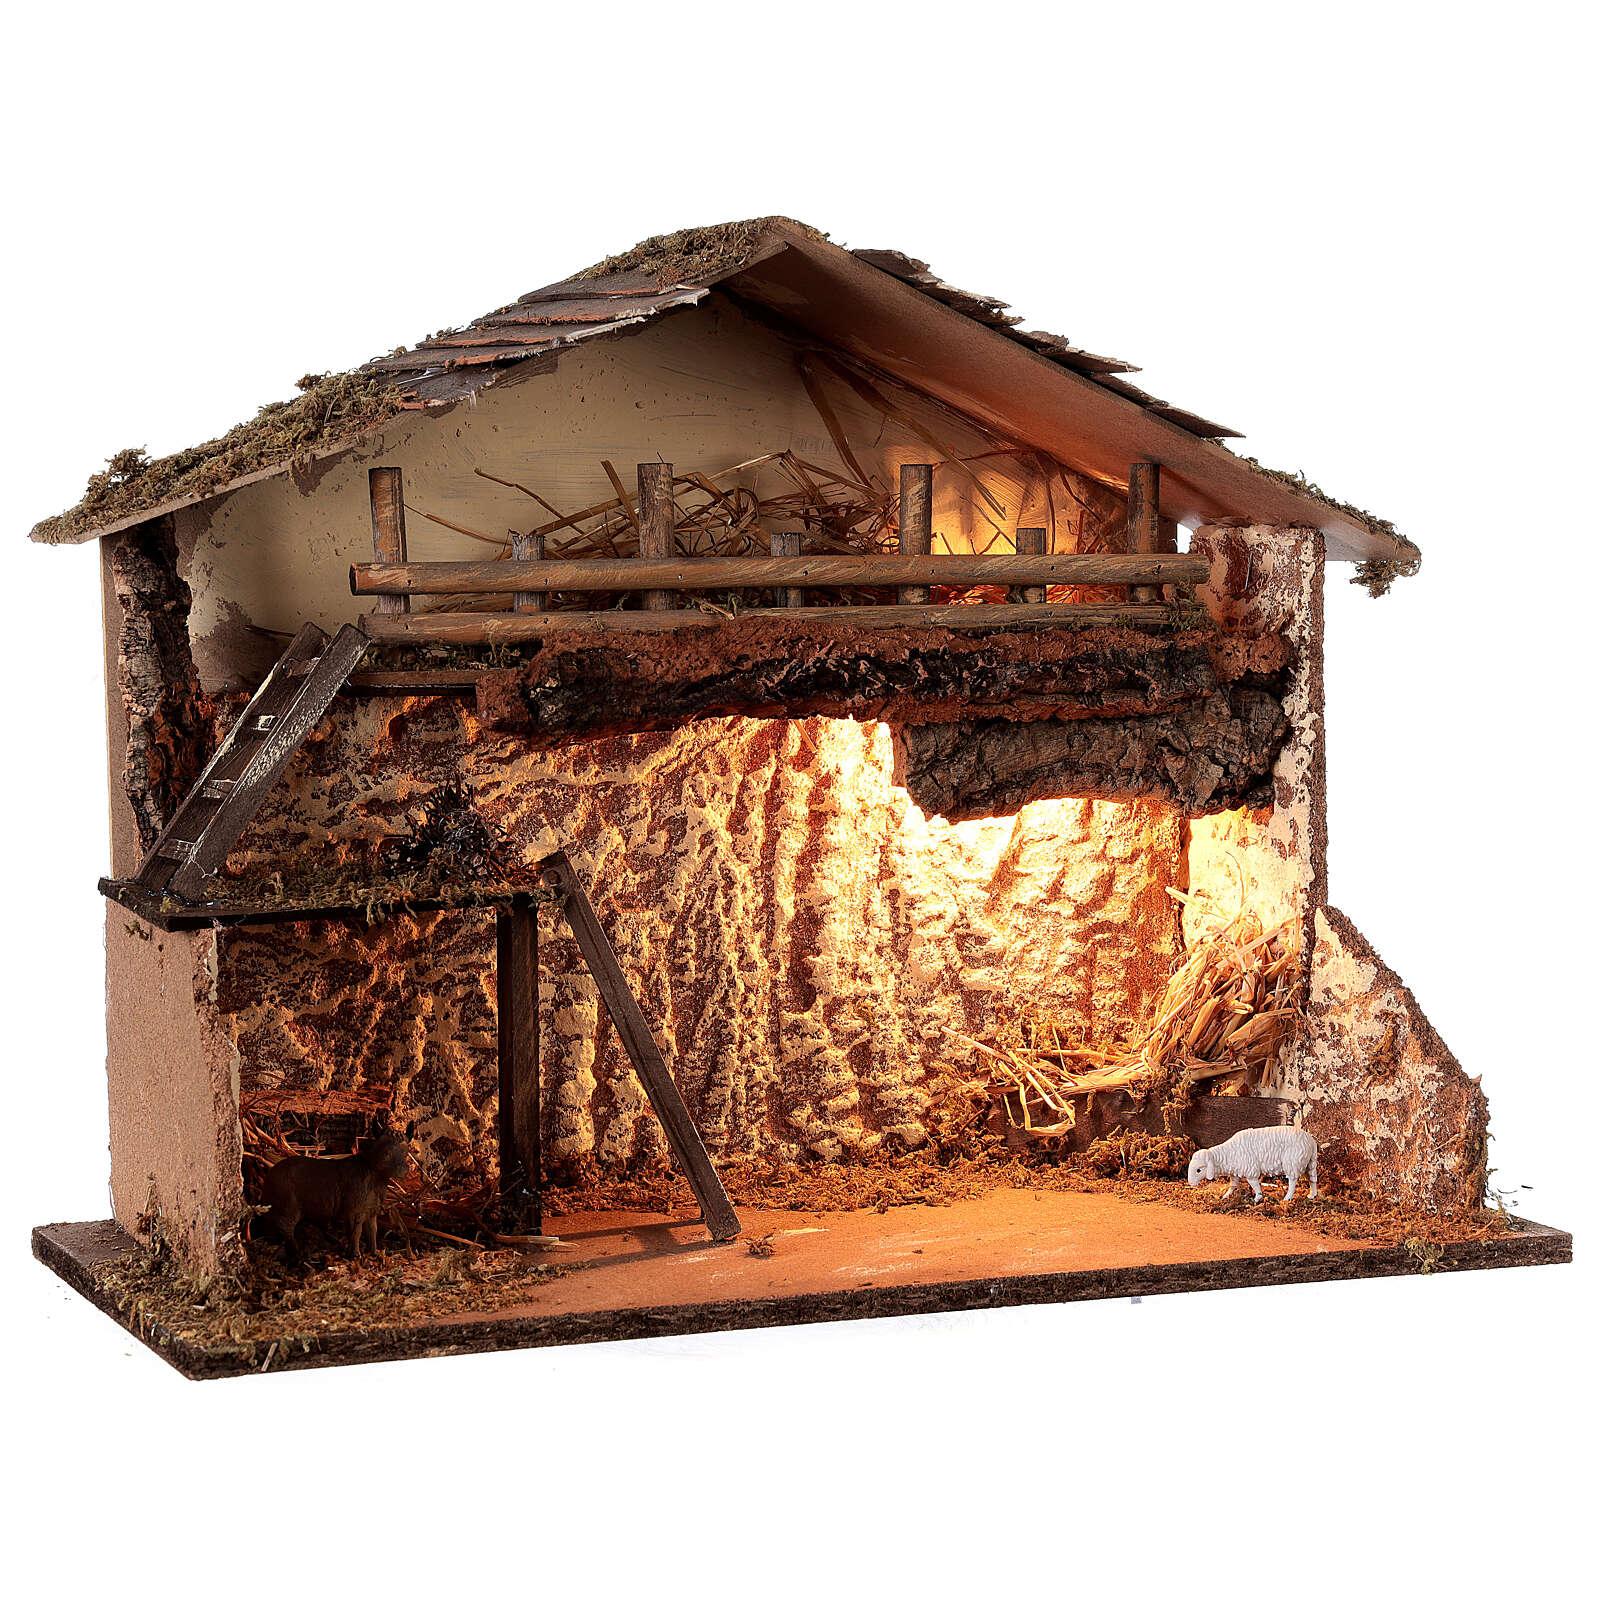 Illuminated hut 35x50x25 cm Nordic nativity scene 12-14 cm 4